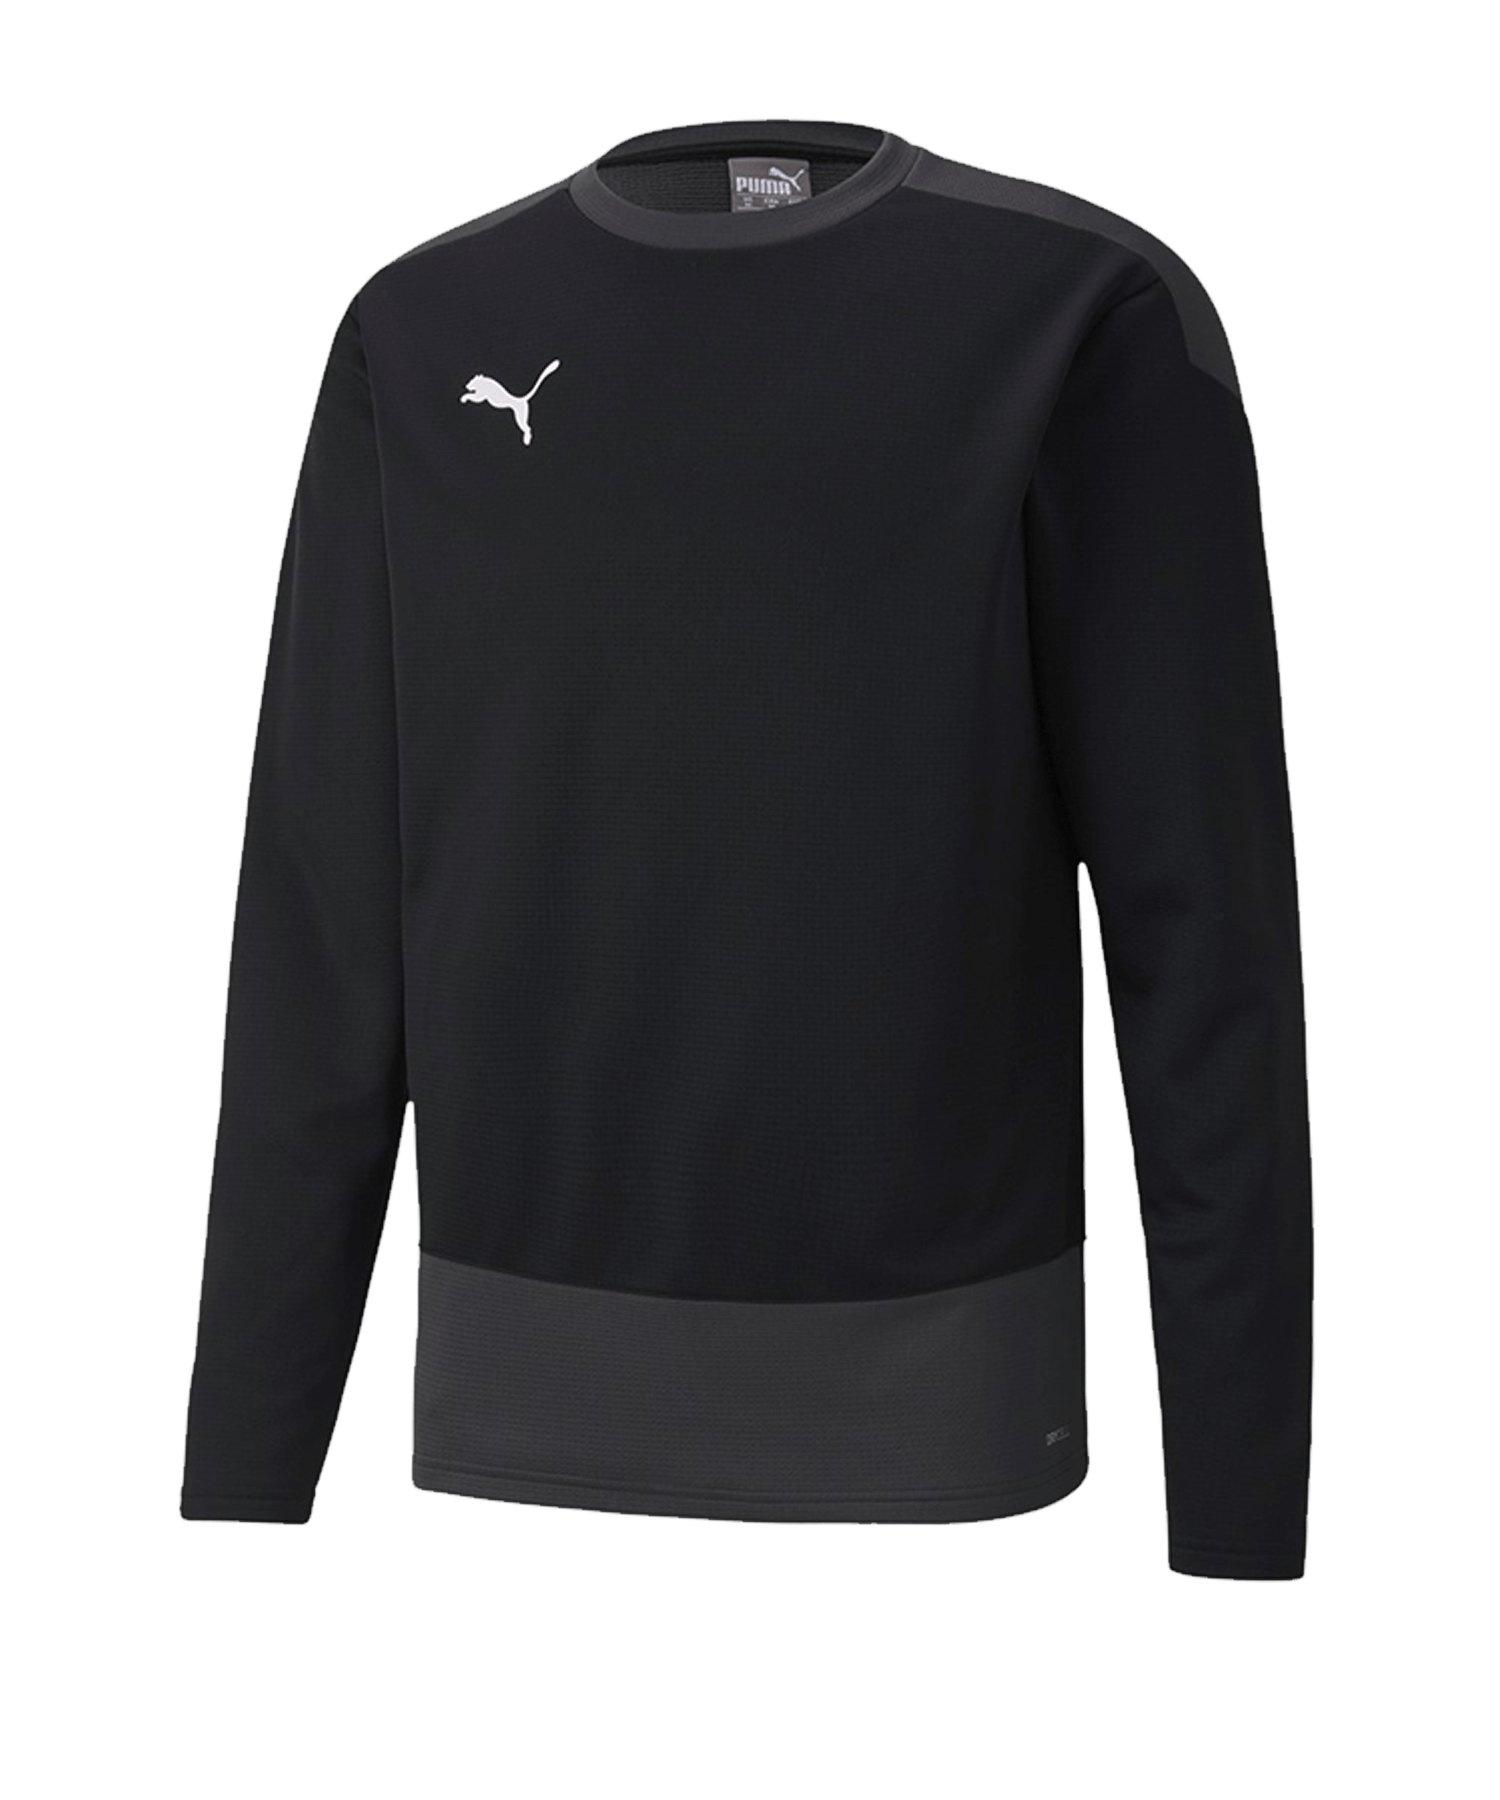 PUMA teamGOAL 23 Training Sweatshirt Schwarz F03 - schwarz